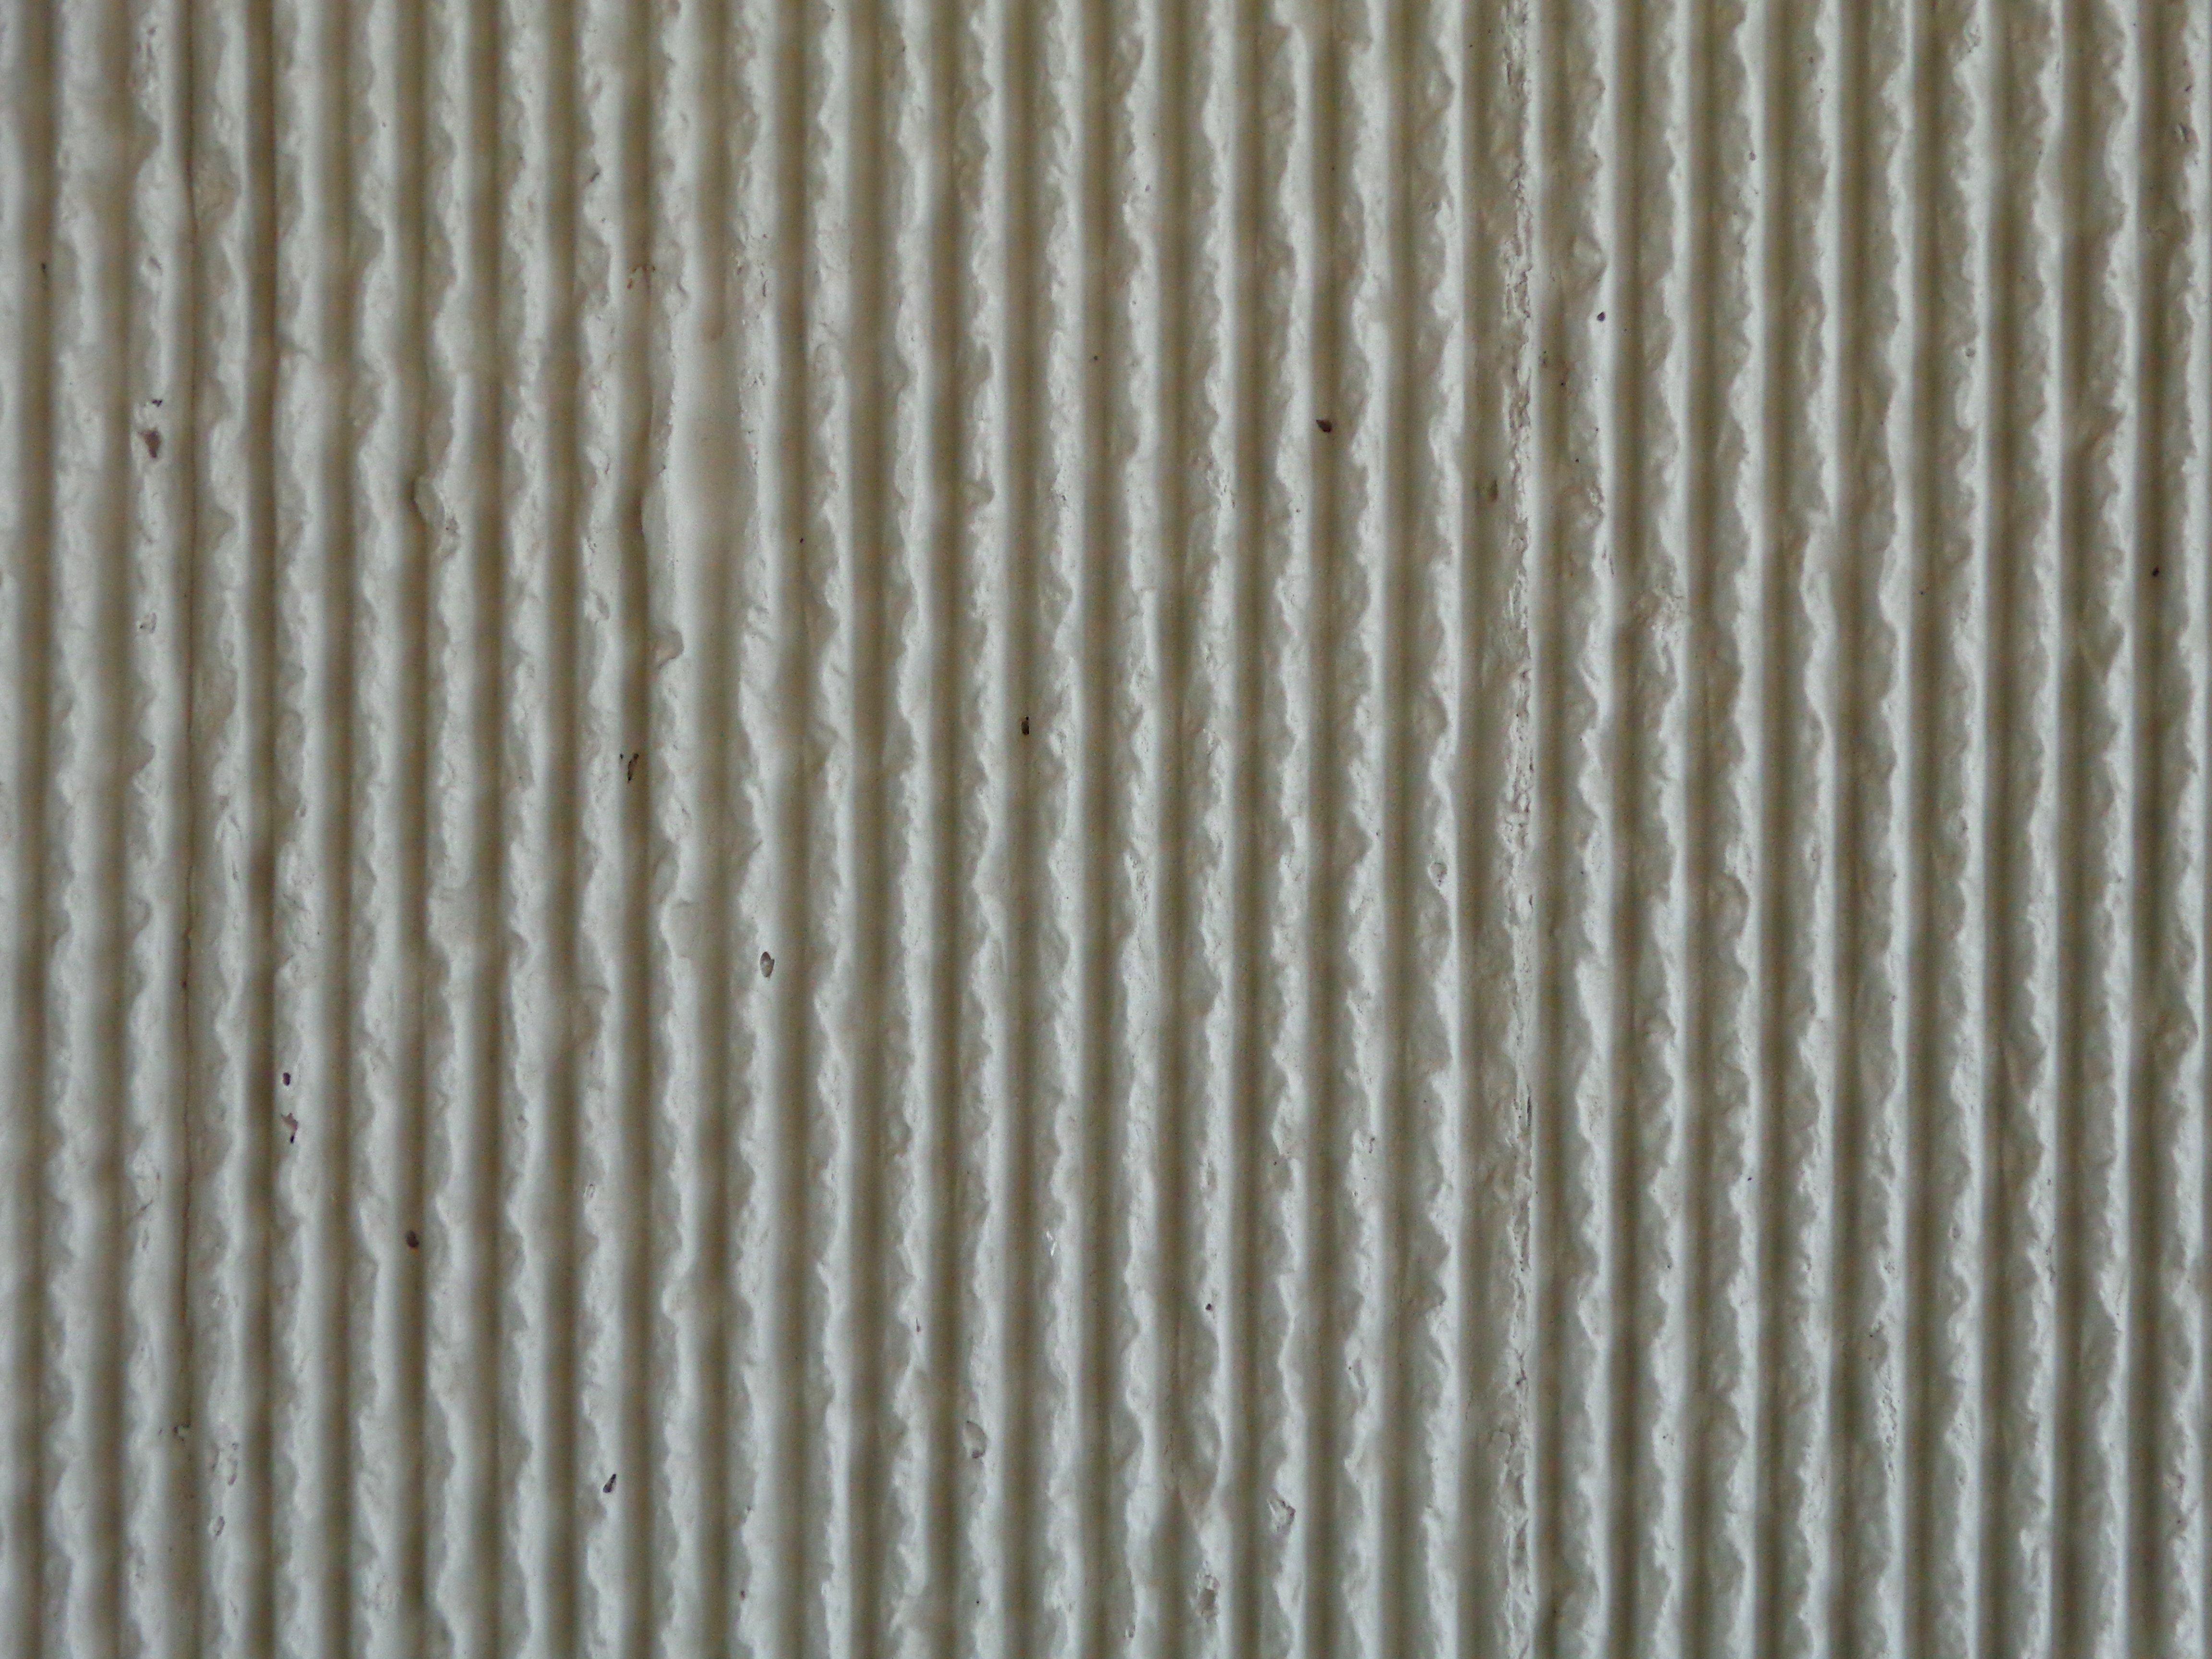 Ribbed Concrete Texture Picture Free Photograph Photos